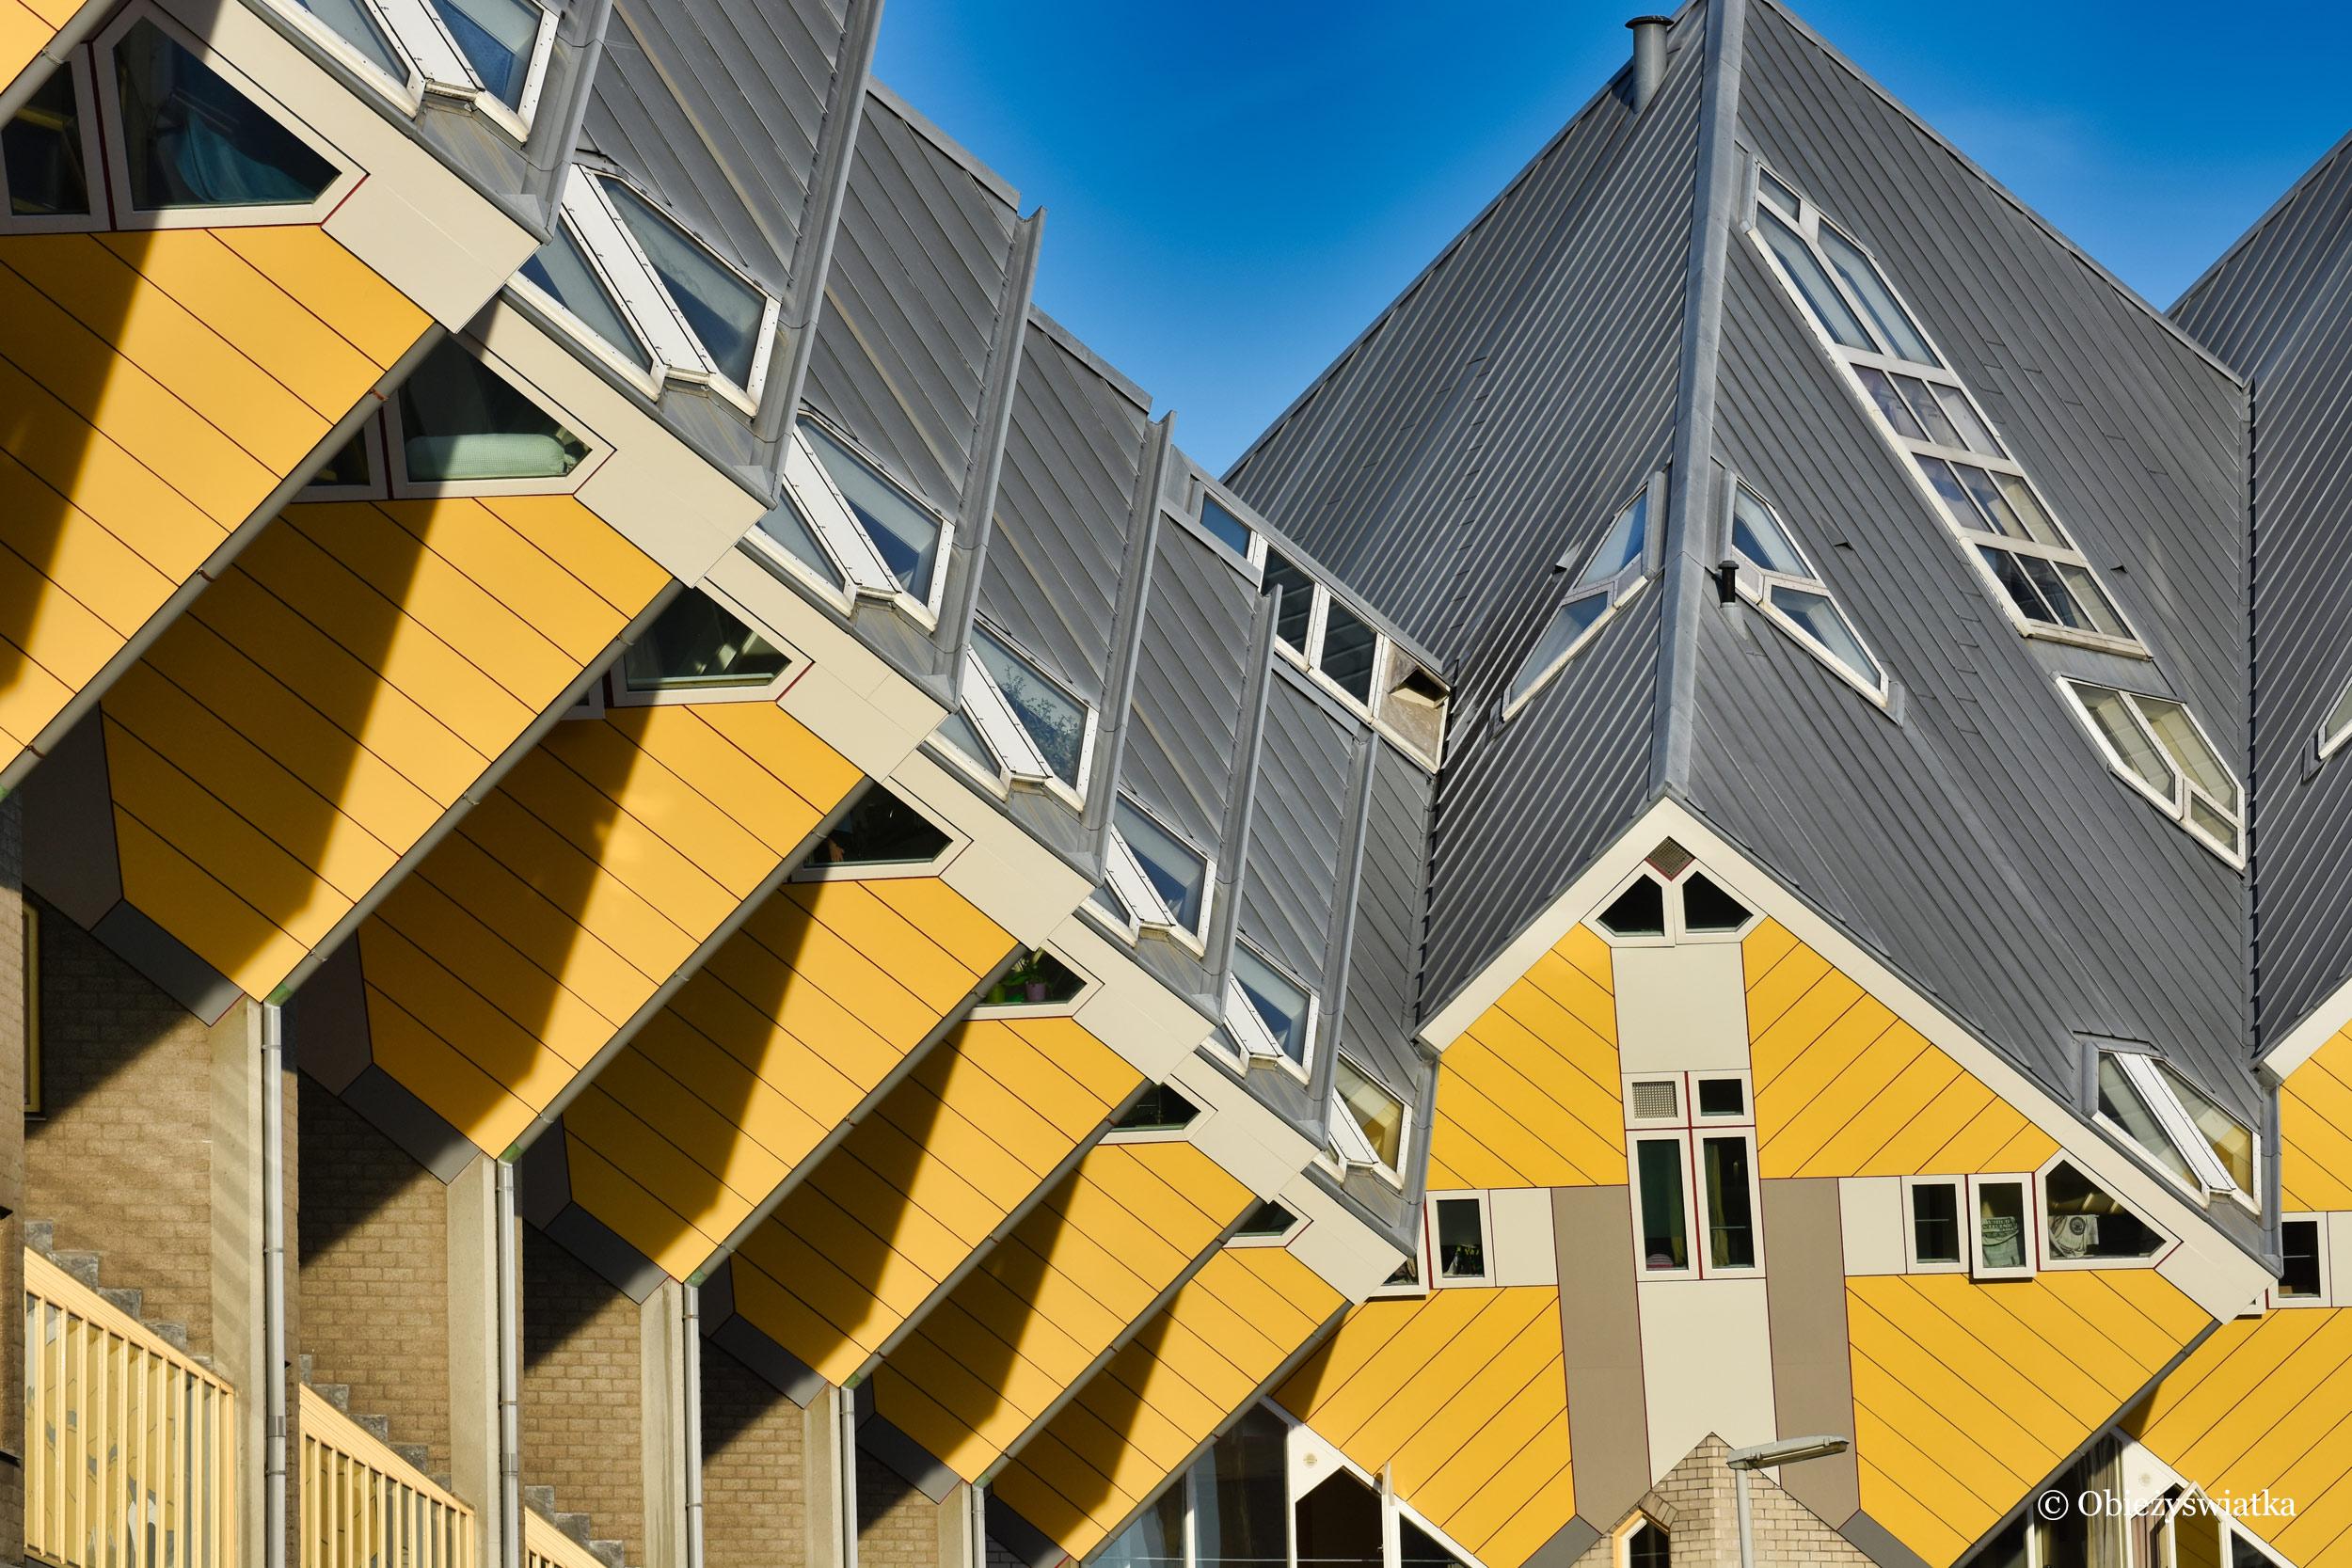 Architektura Rotterdamu - Cube Houses